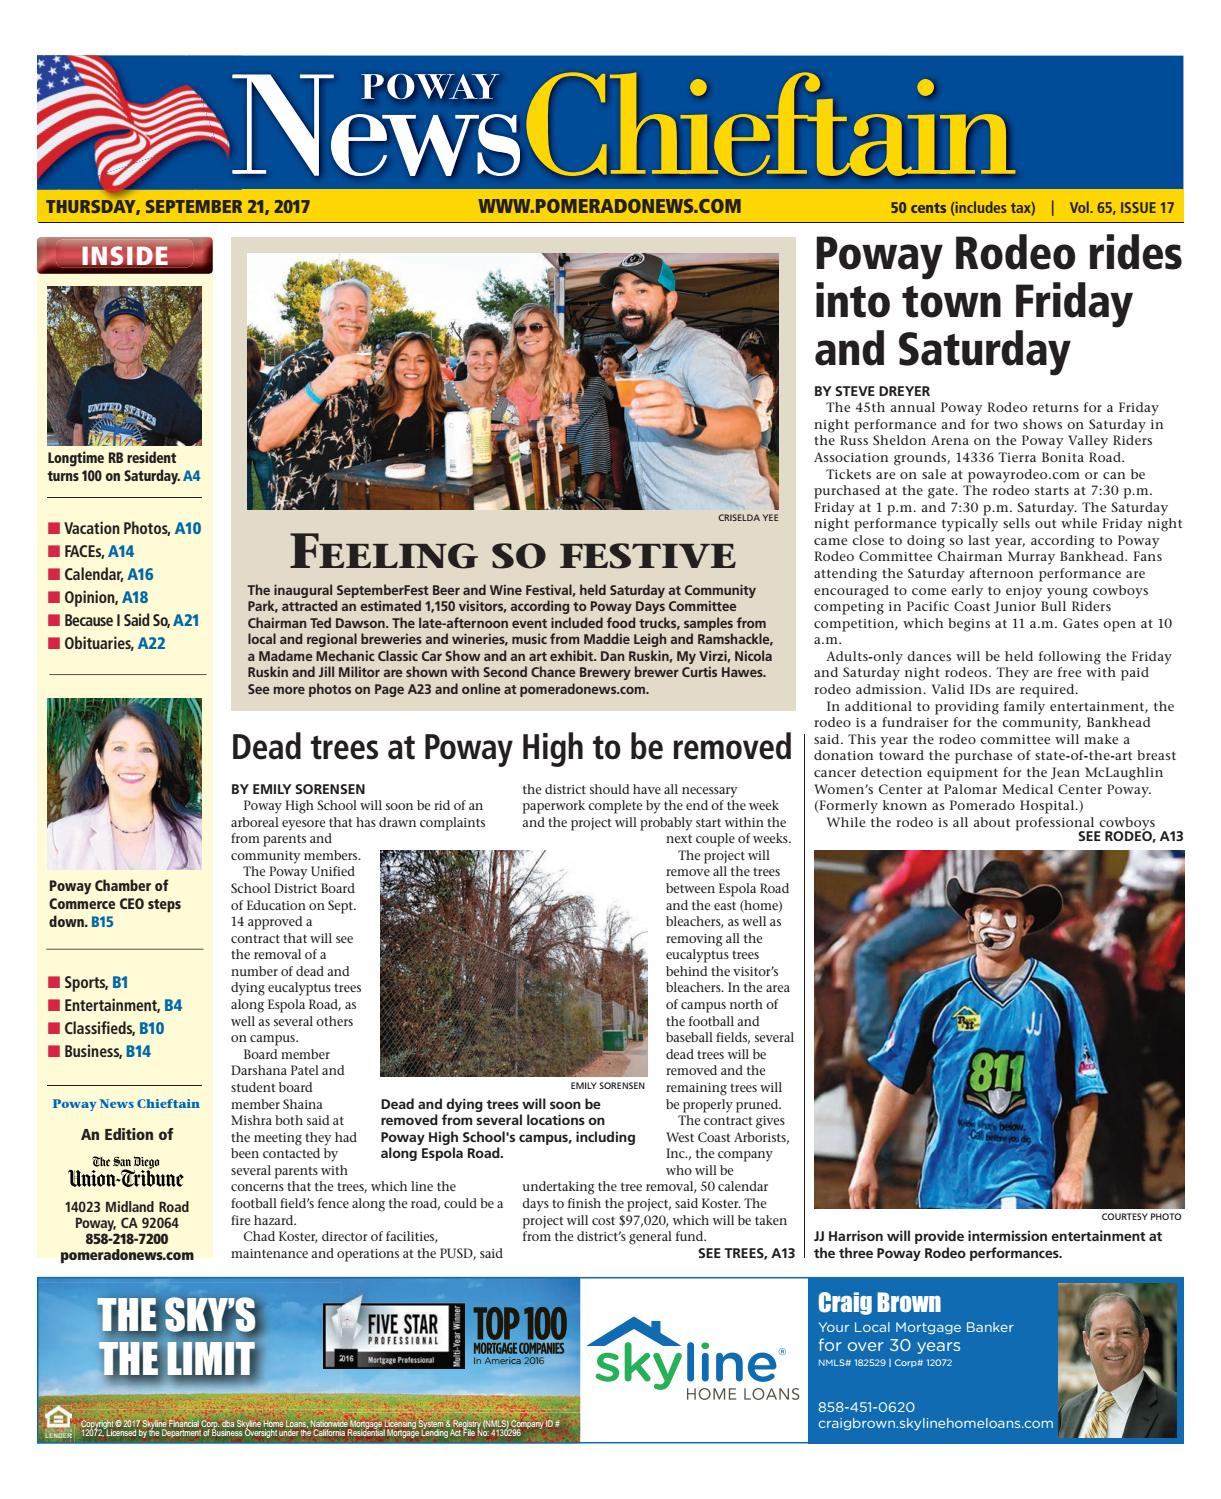 583d499ae94306 Poway News Chieftain 09 21 17 by MainStreet Media - issuu